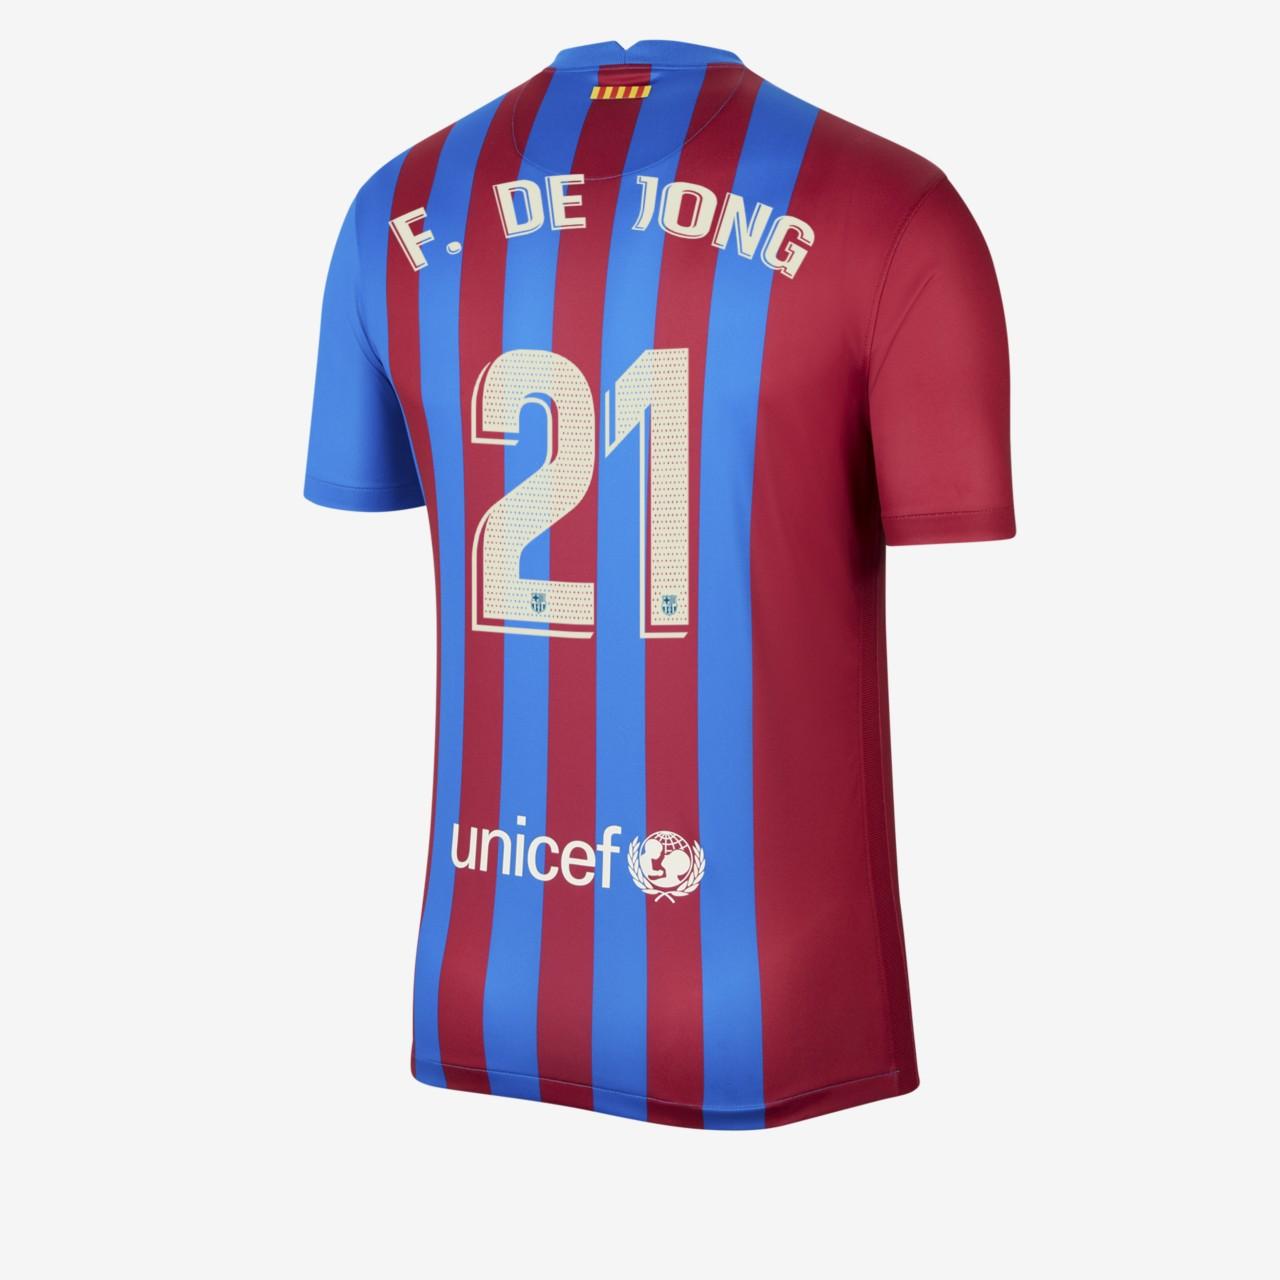 Flocage De Jong maillot FC Barcelone 2021-2022